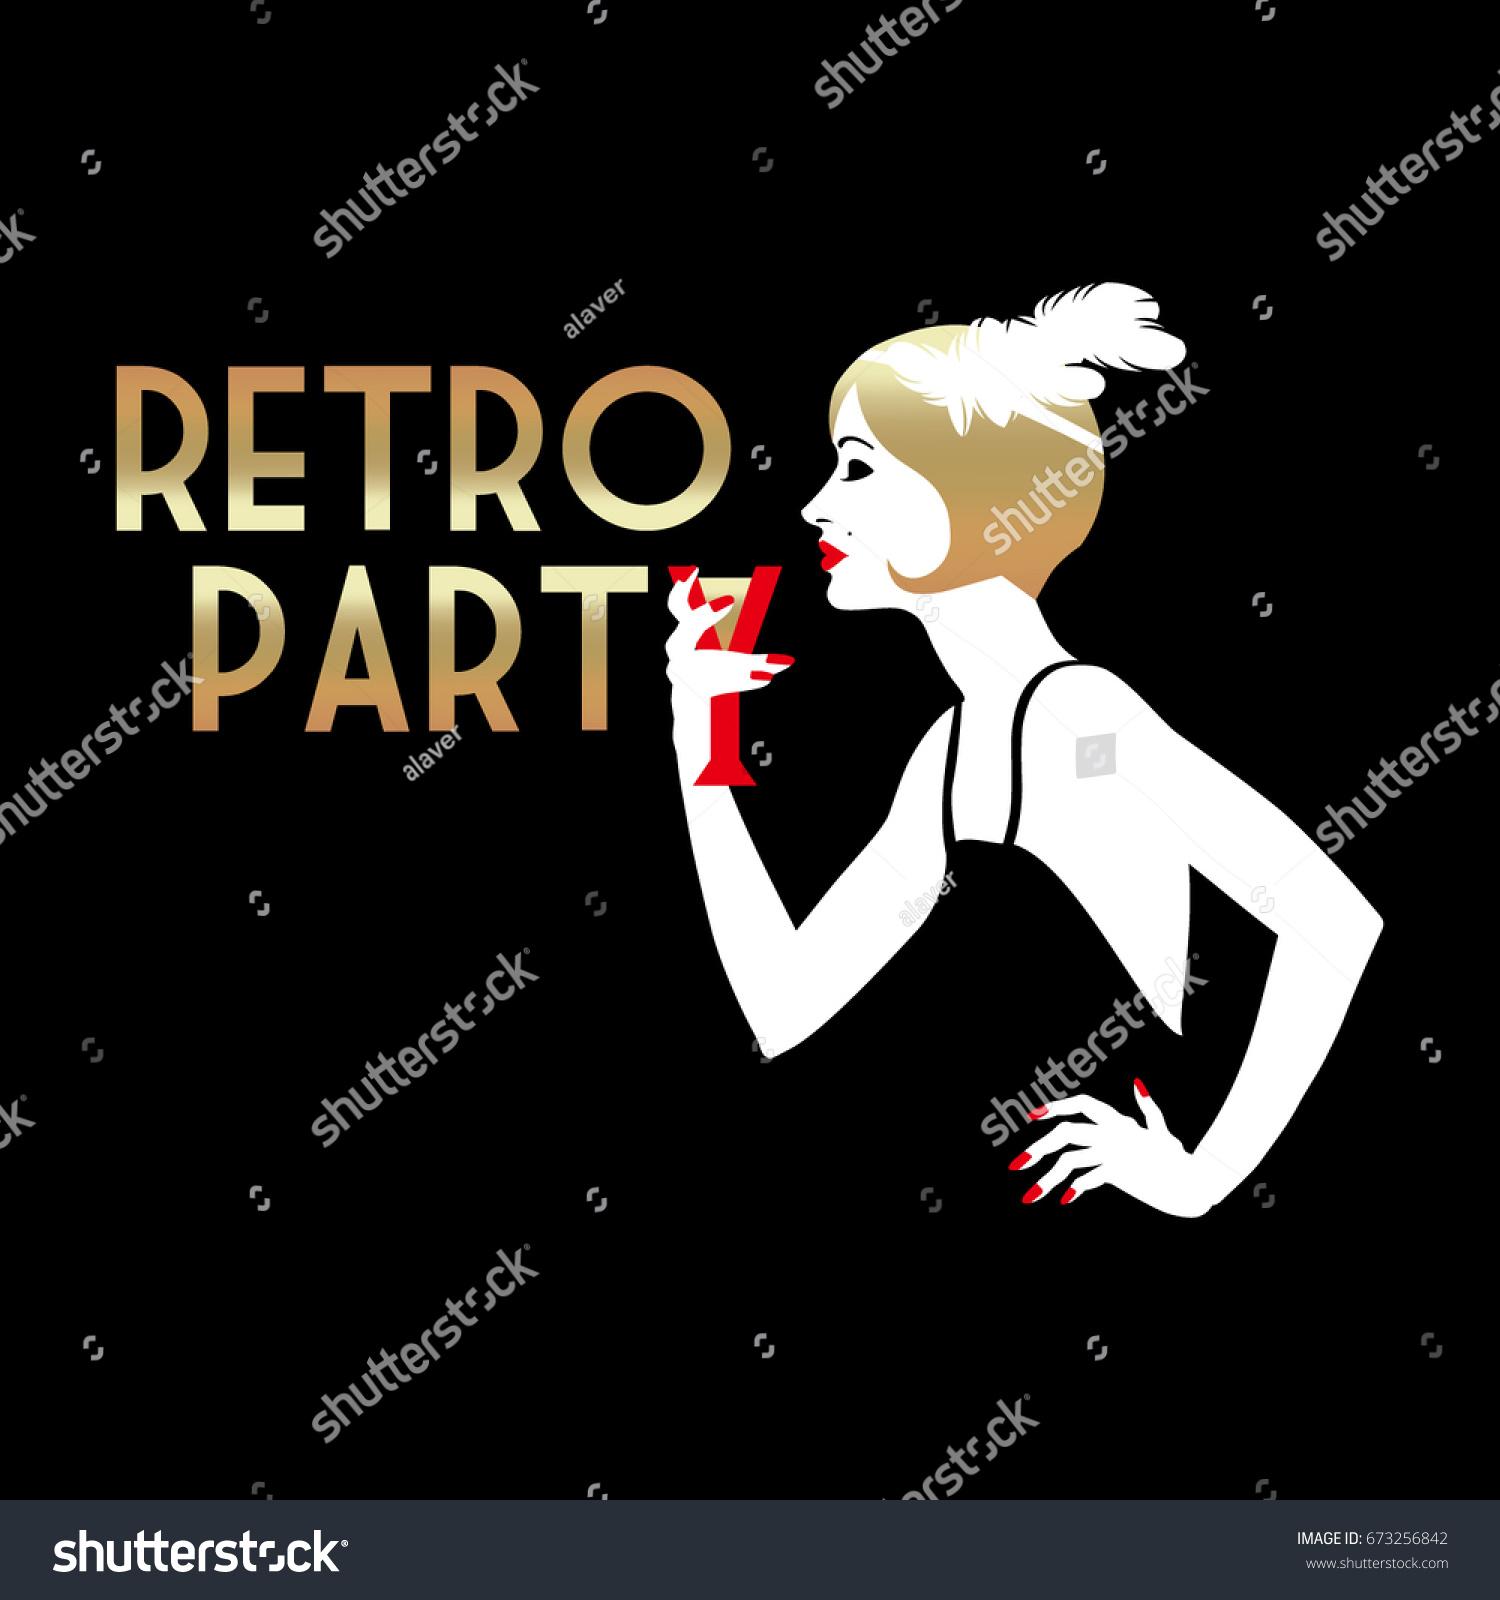 Retro Party Invitation Card Handmade Drawing Stock Vector 673256842 ...